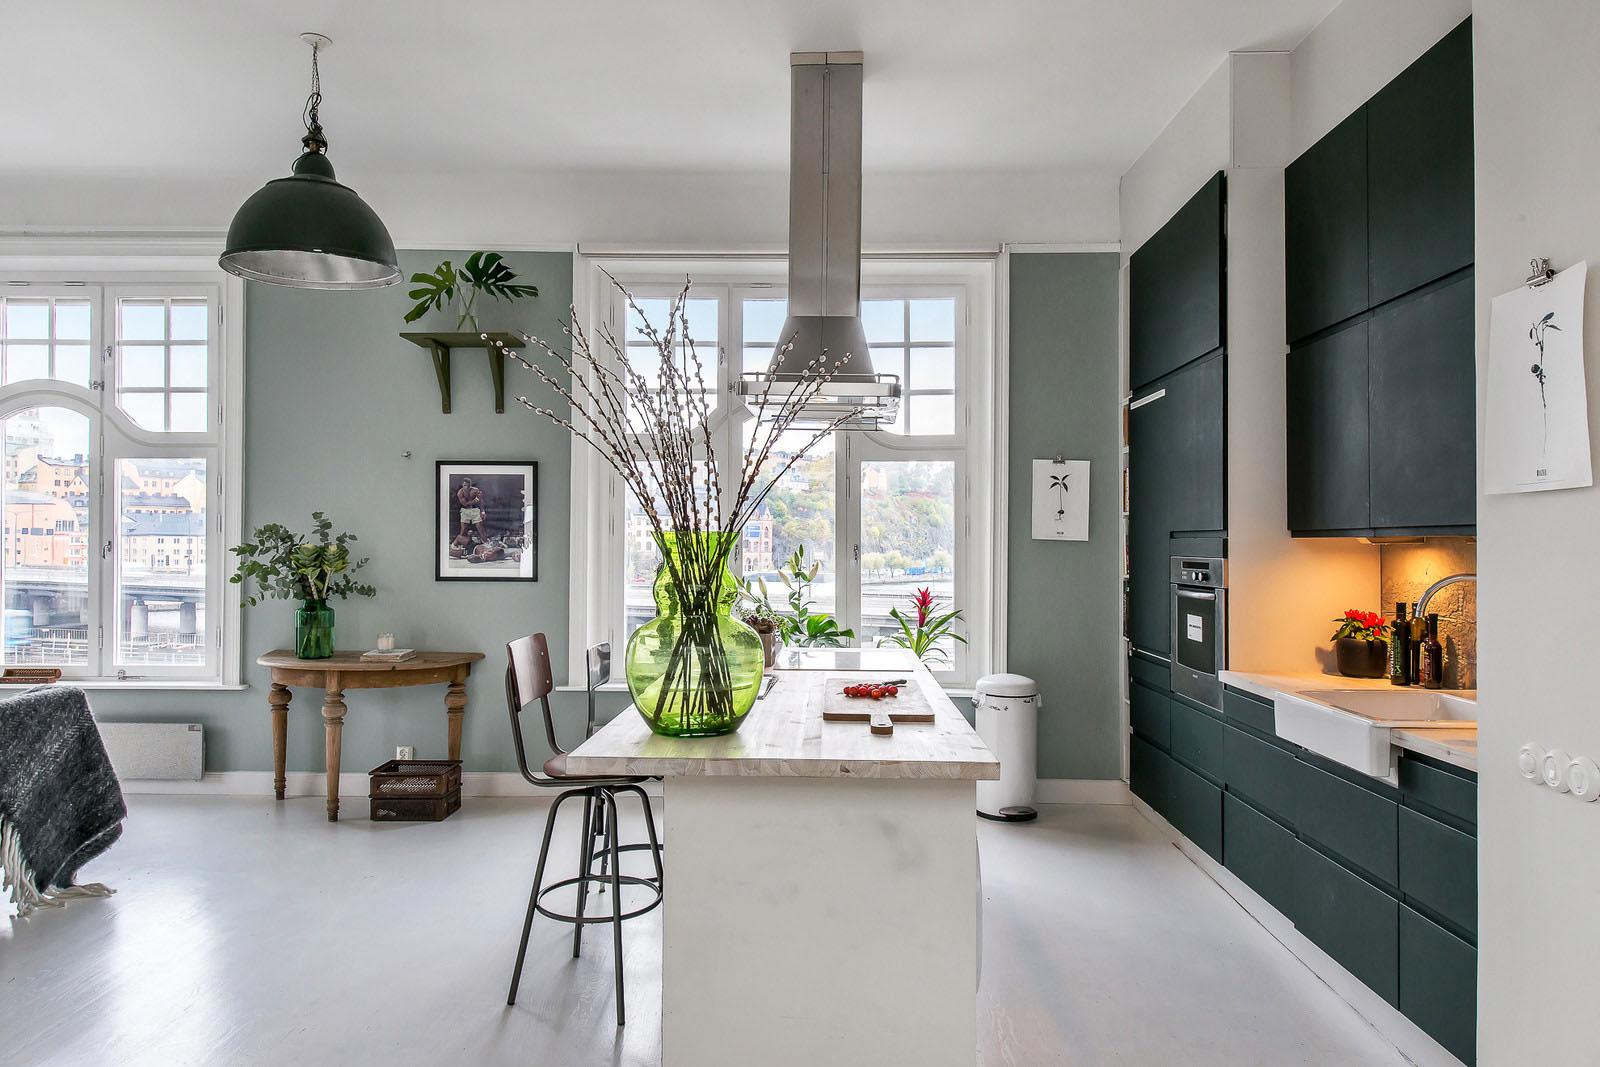 1 000 Square Foot Apartment Exudes Casual Elegance